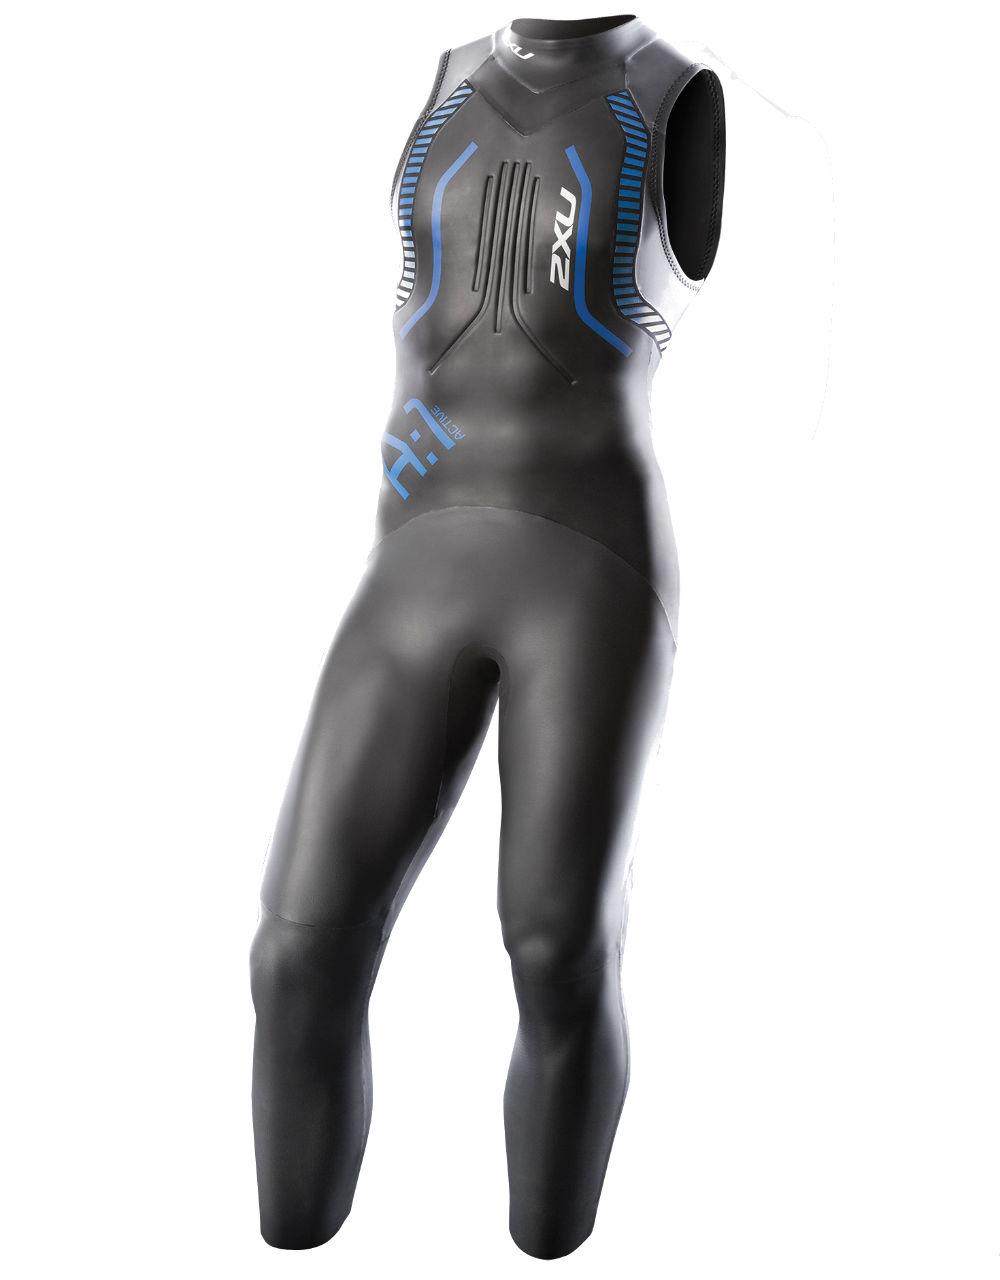 739c5c5b64 Buy 2XU Men s A 1 Active Sleeveless Triathlon Wetsuit